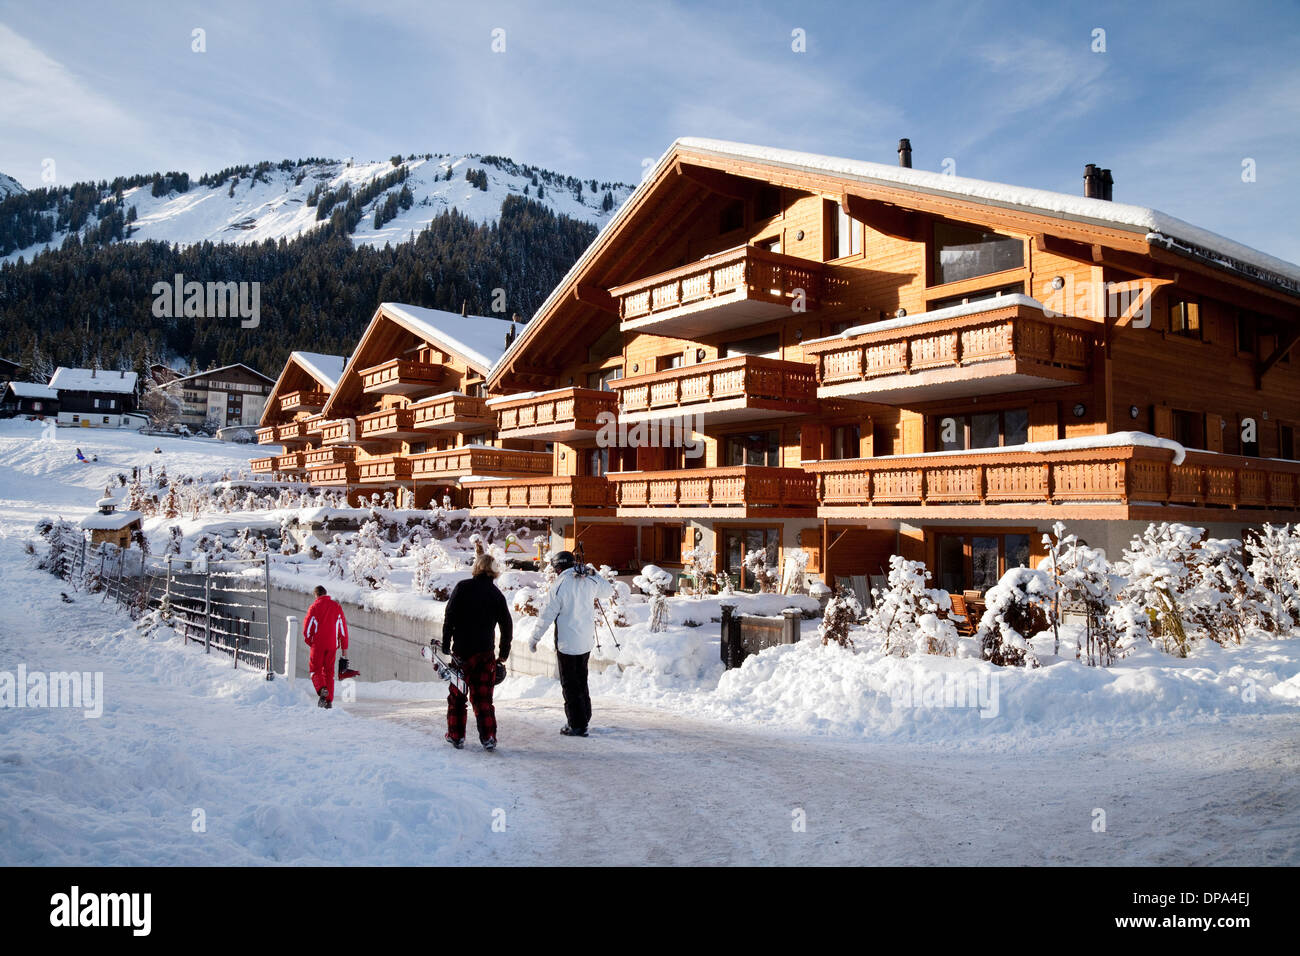 Skiers returning to their ski chalet, Swiss skiing village of Morgins, Switzerland Europe - Stock Image